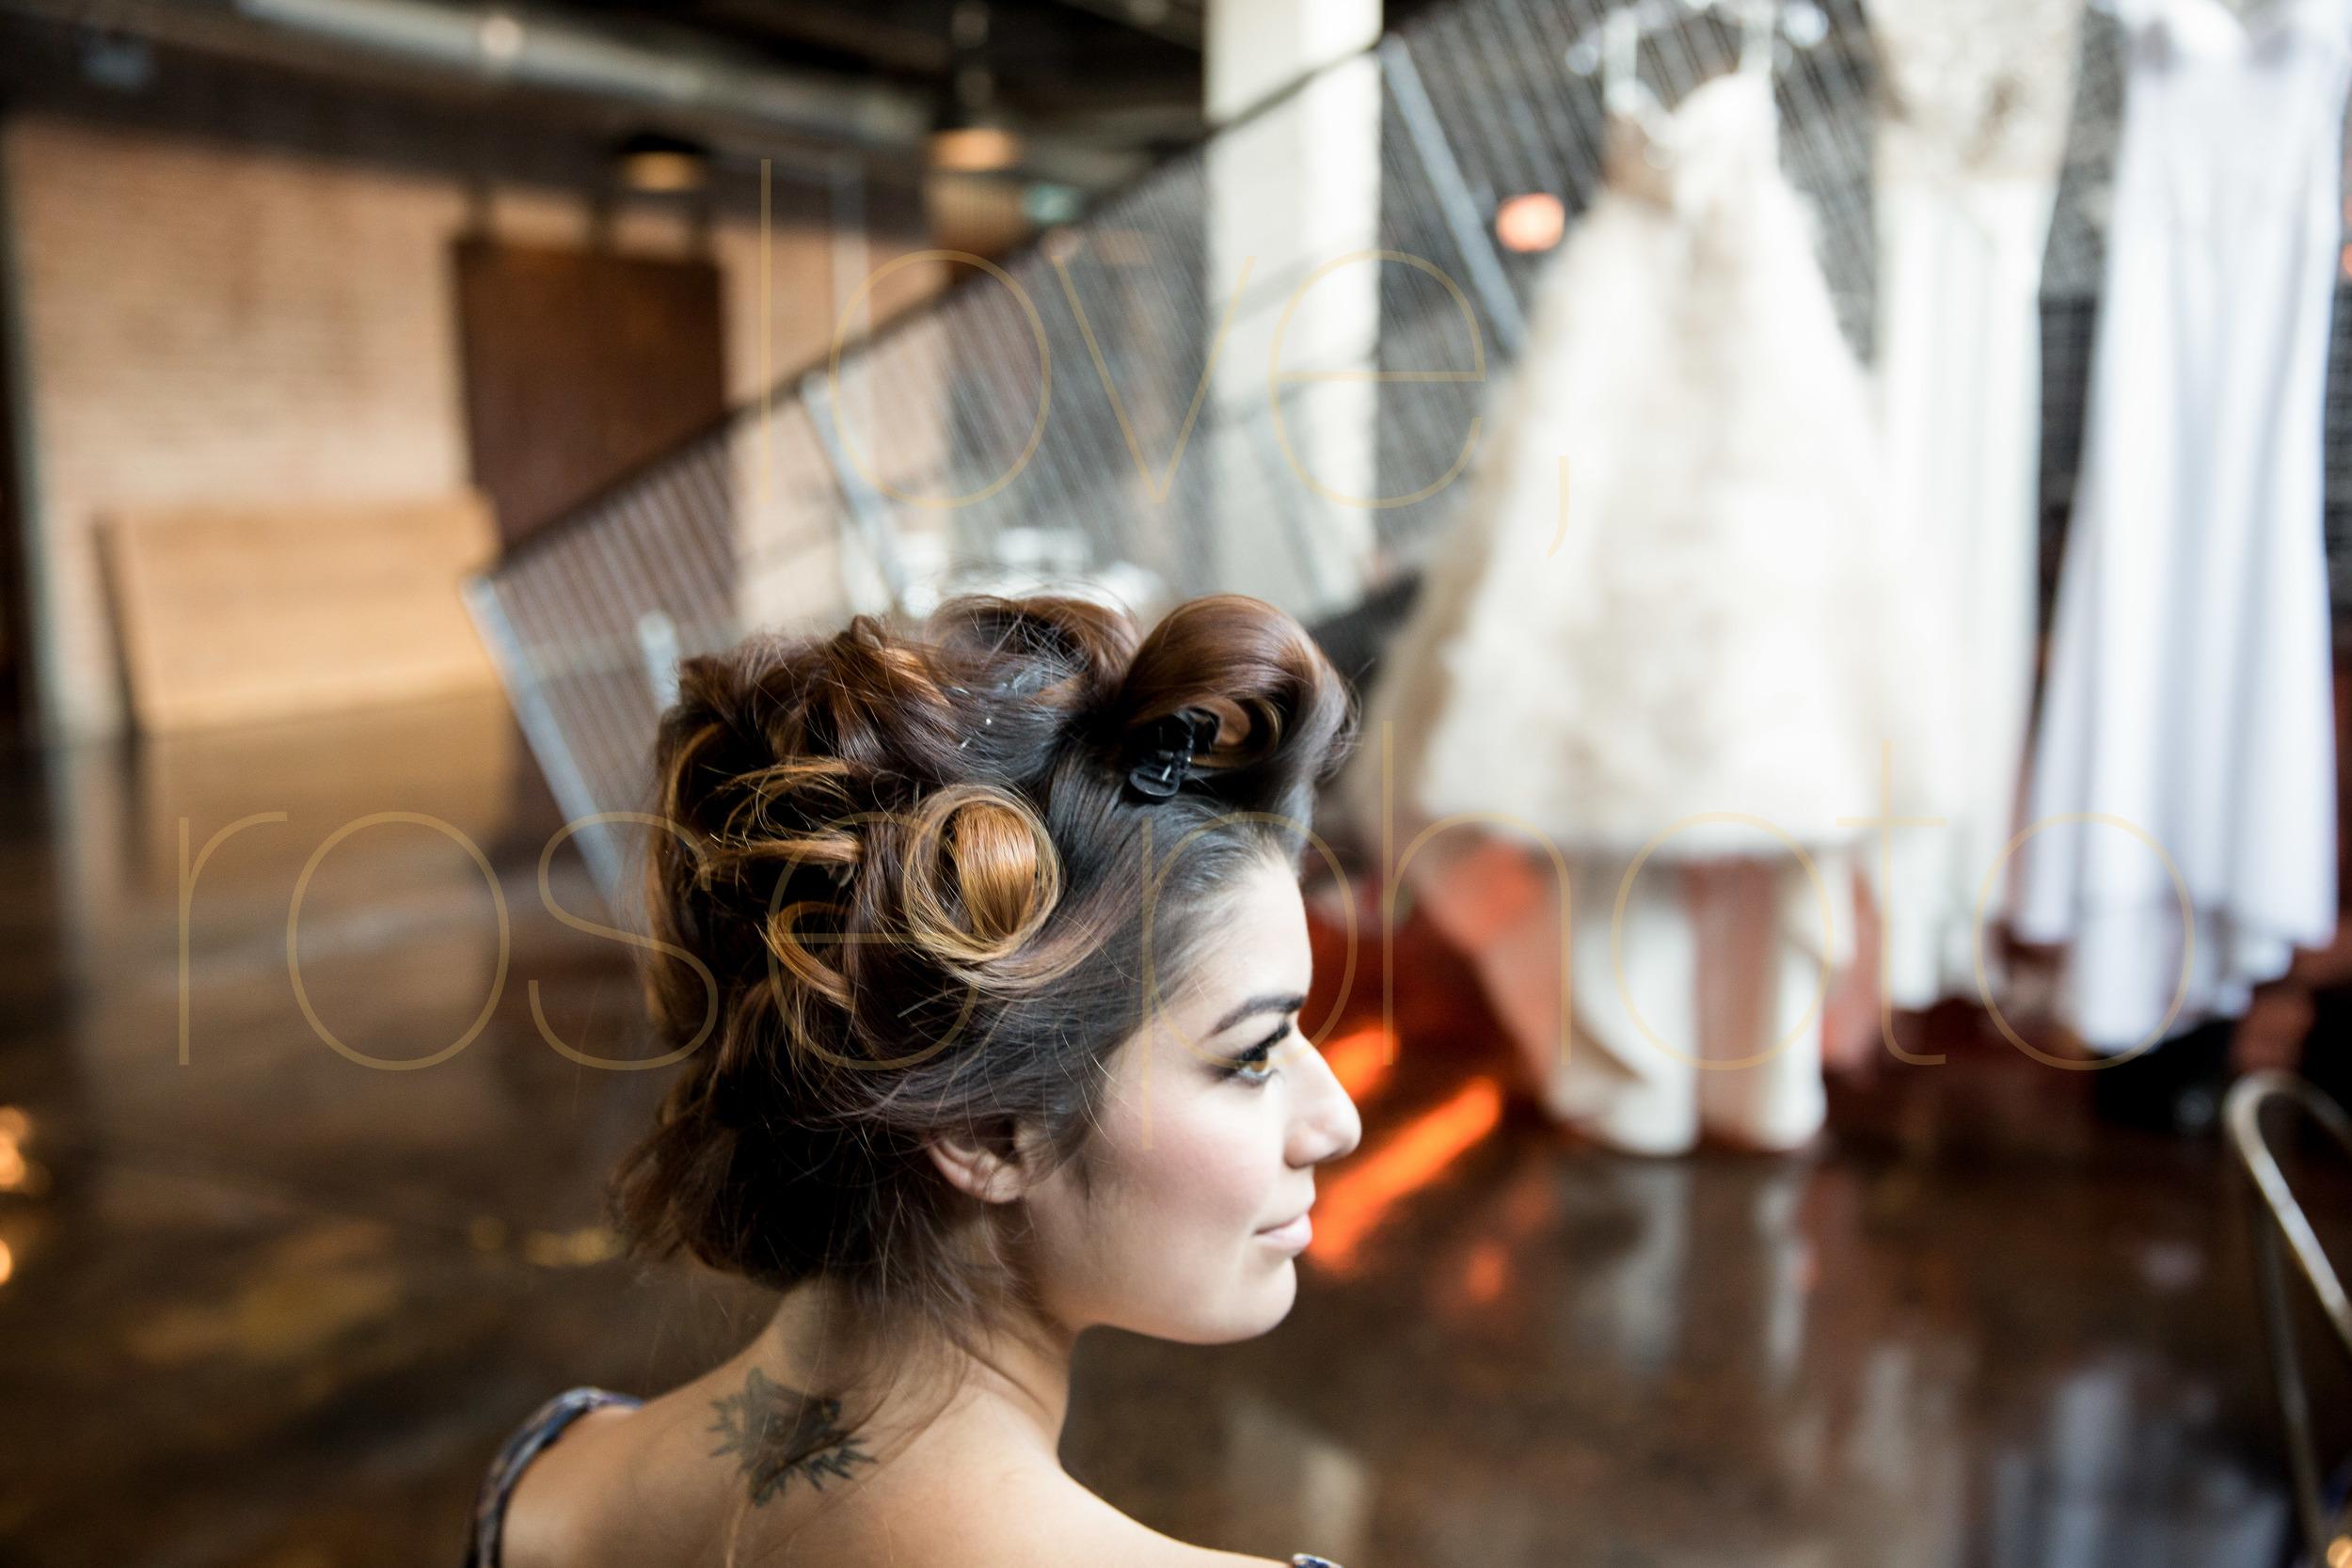 Morgan MFG West Loop Chicago Wedding Venue Photography Portrait Photographer -7.jpg